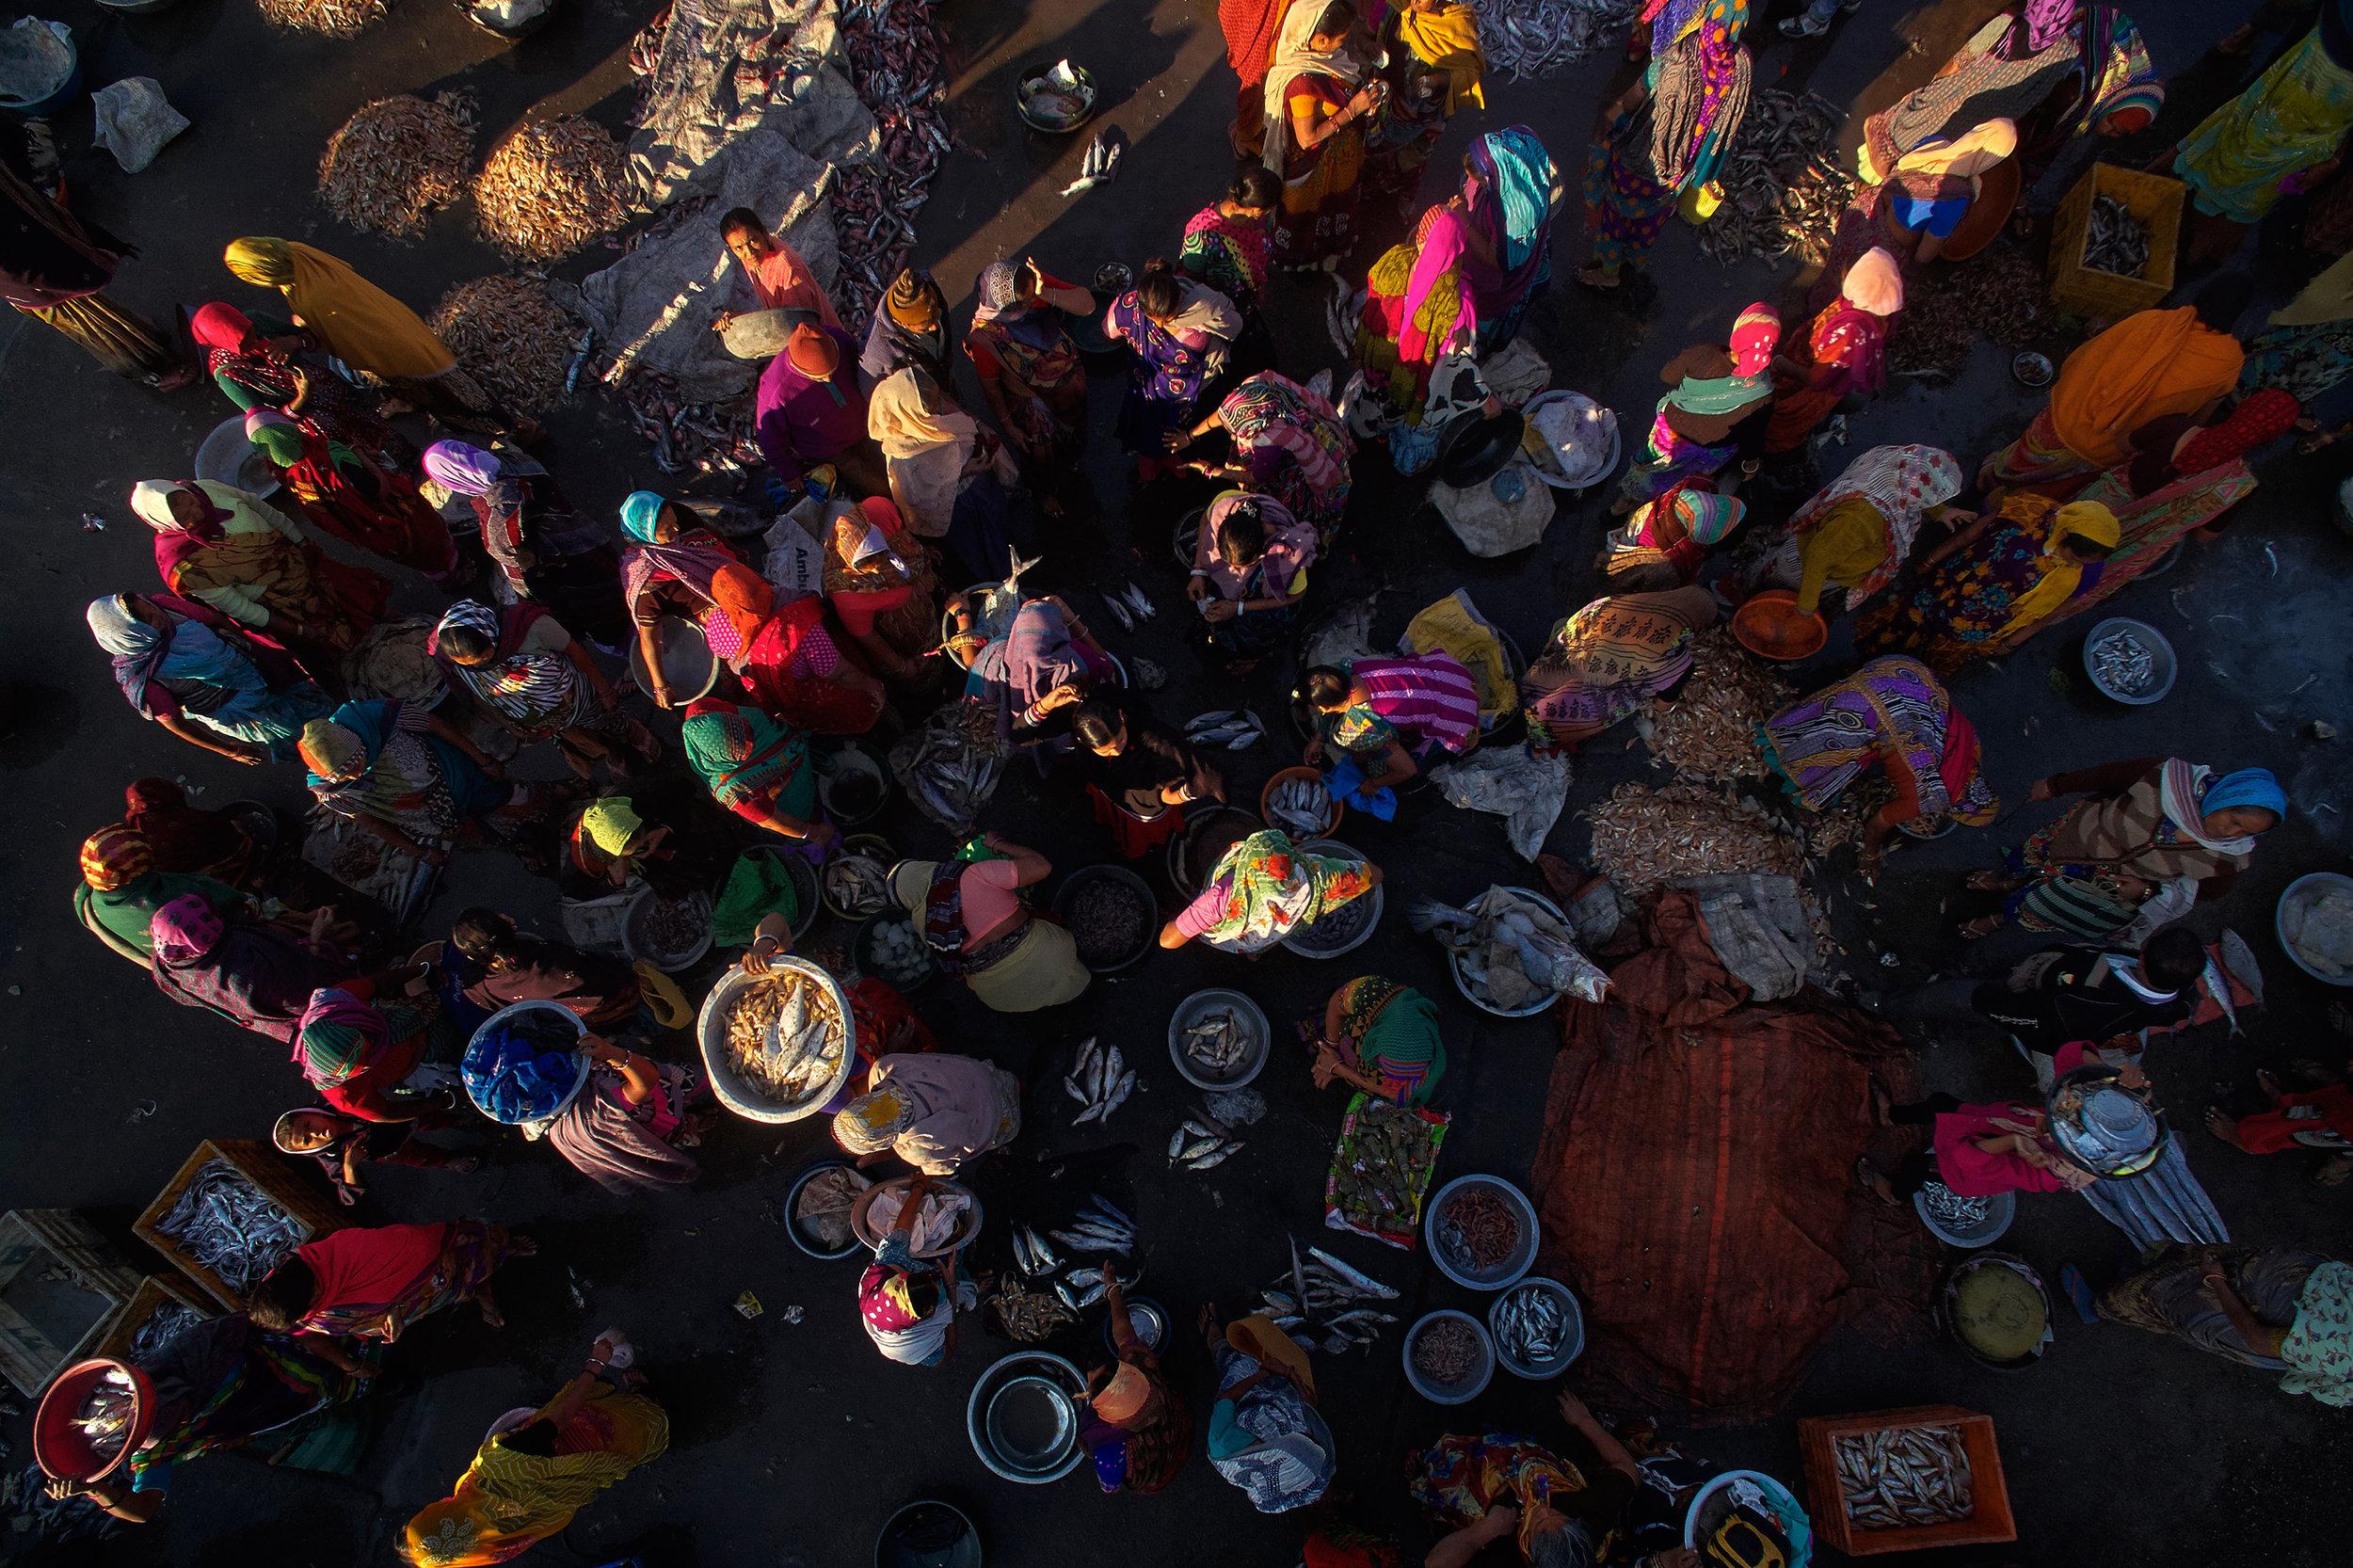 Aerial image of women at a fish market in Diu, Gujarat, India